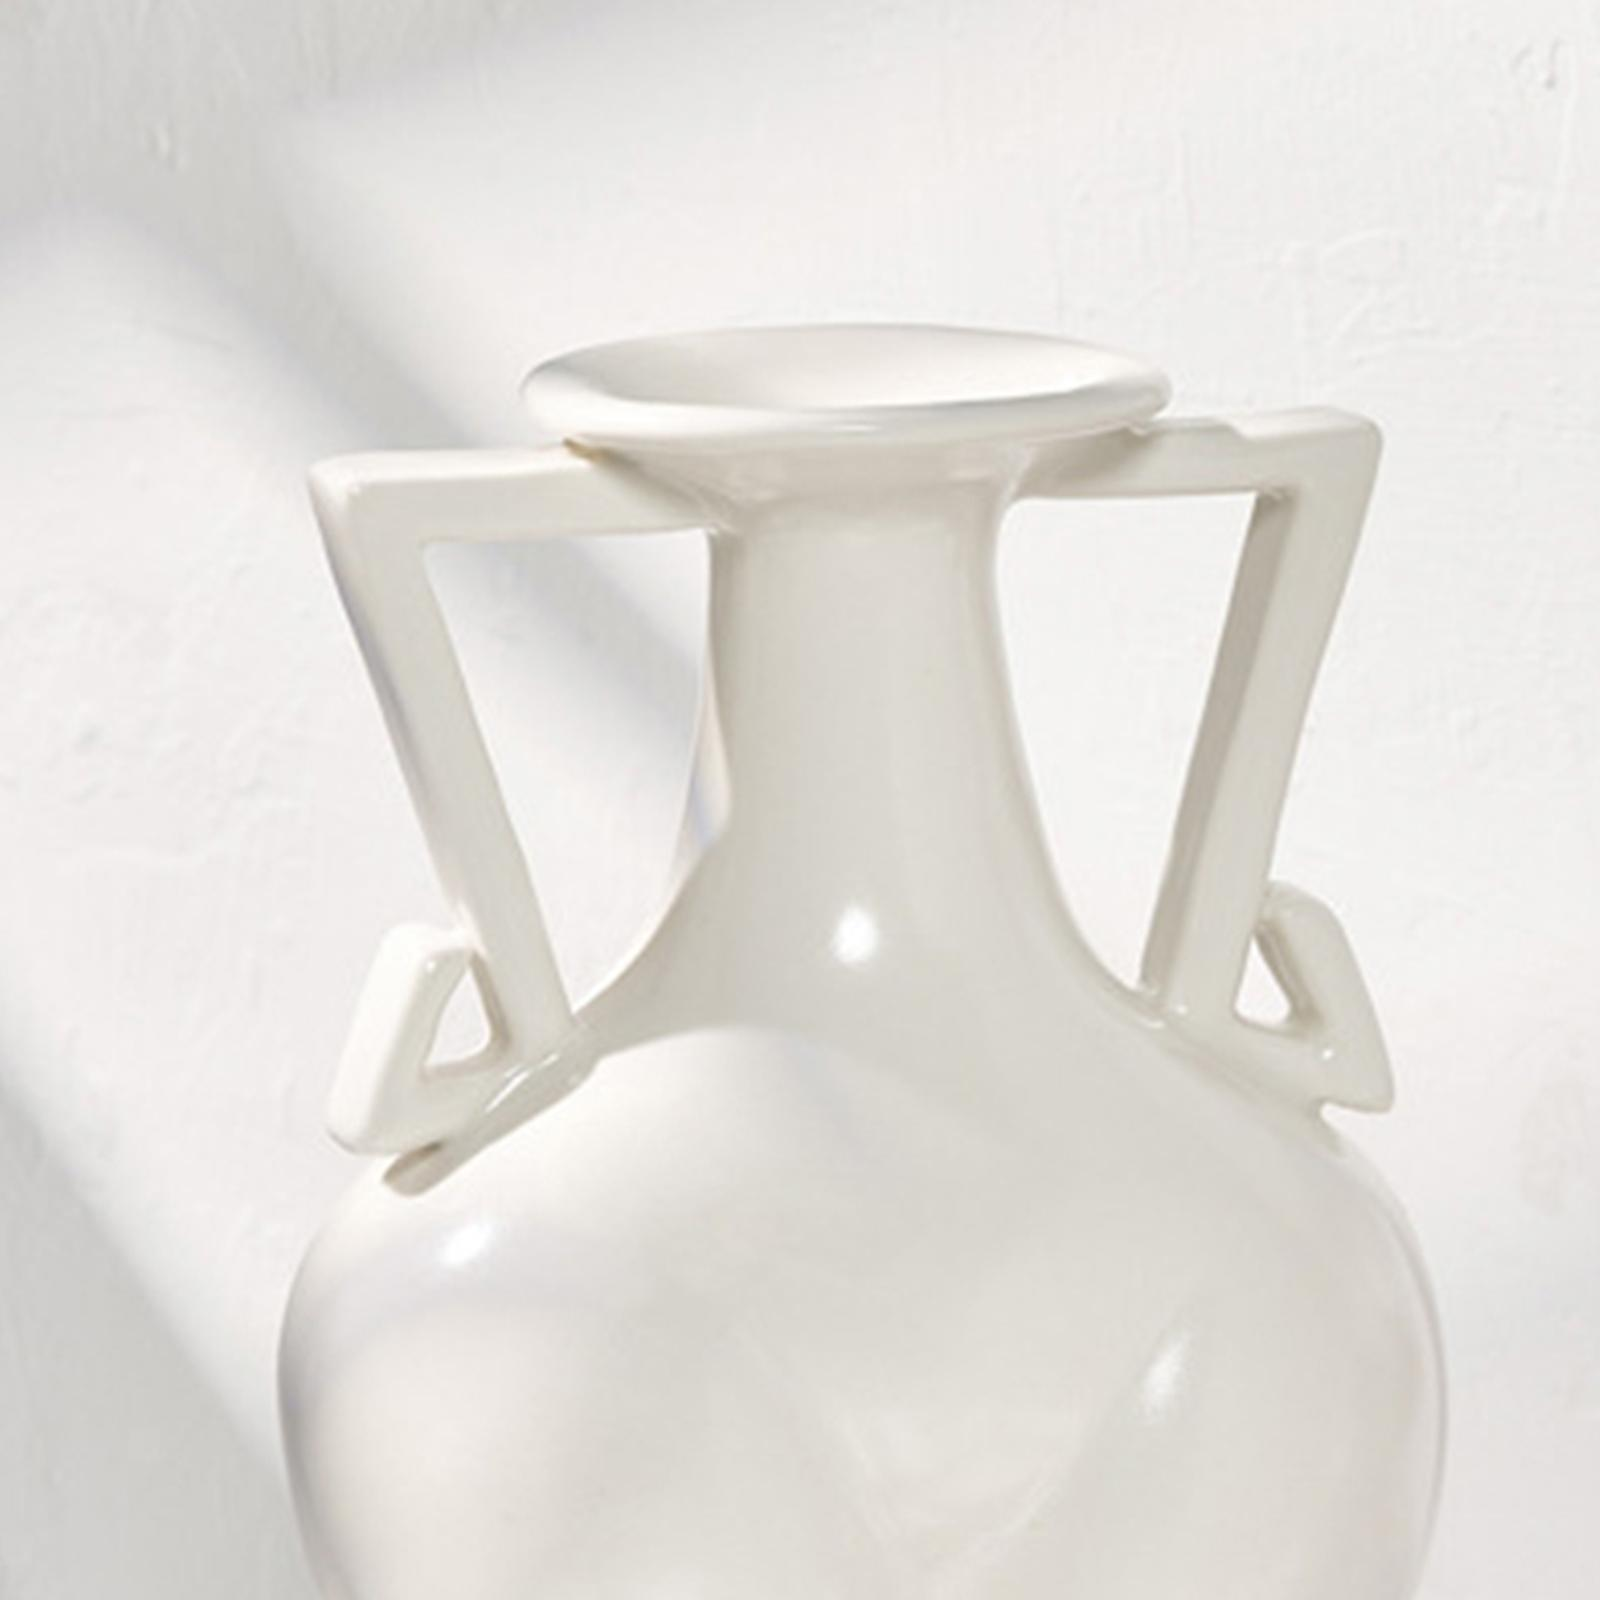 Indexbild 21 - Blumenvase Keramik Blumentöpfe Trockenblumenhalter Pflanzenvasen Wohnkultur